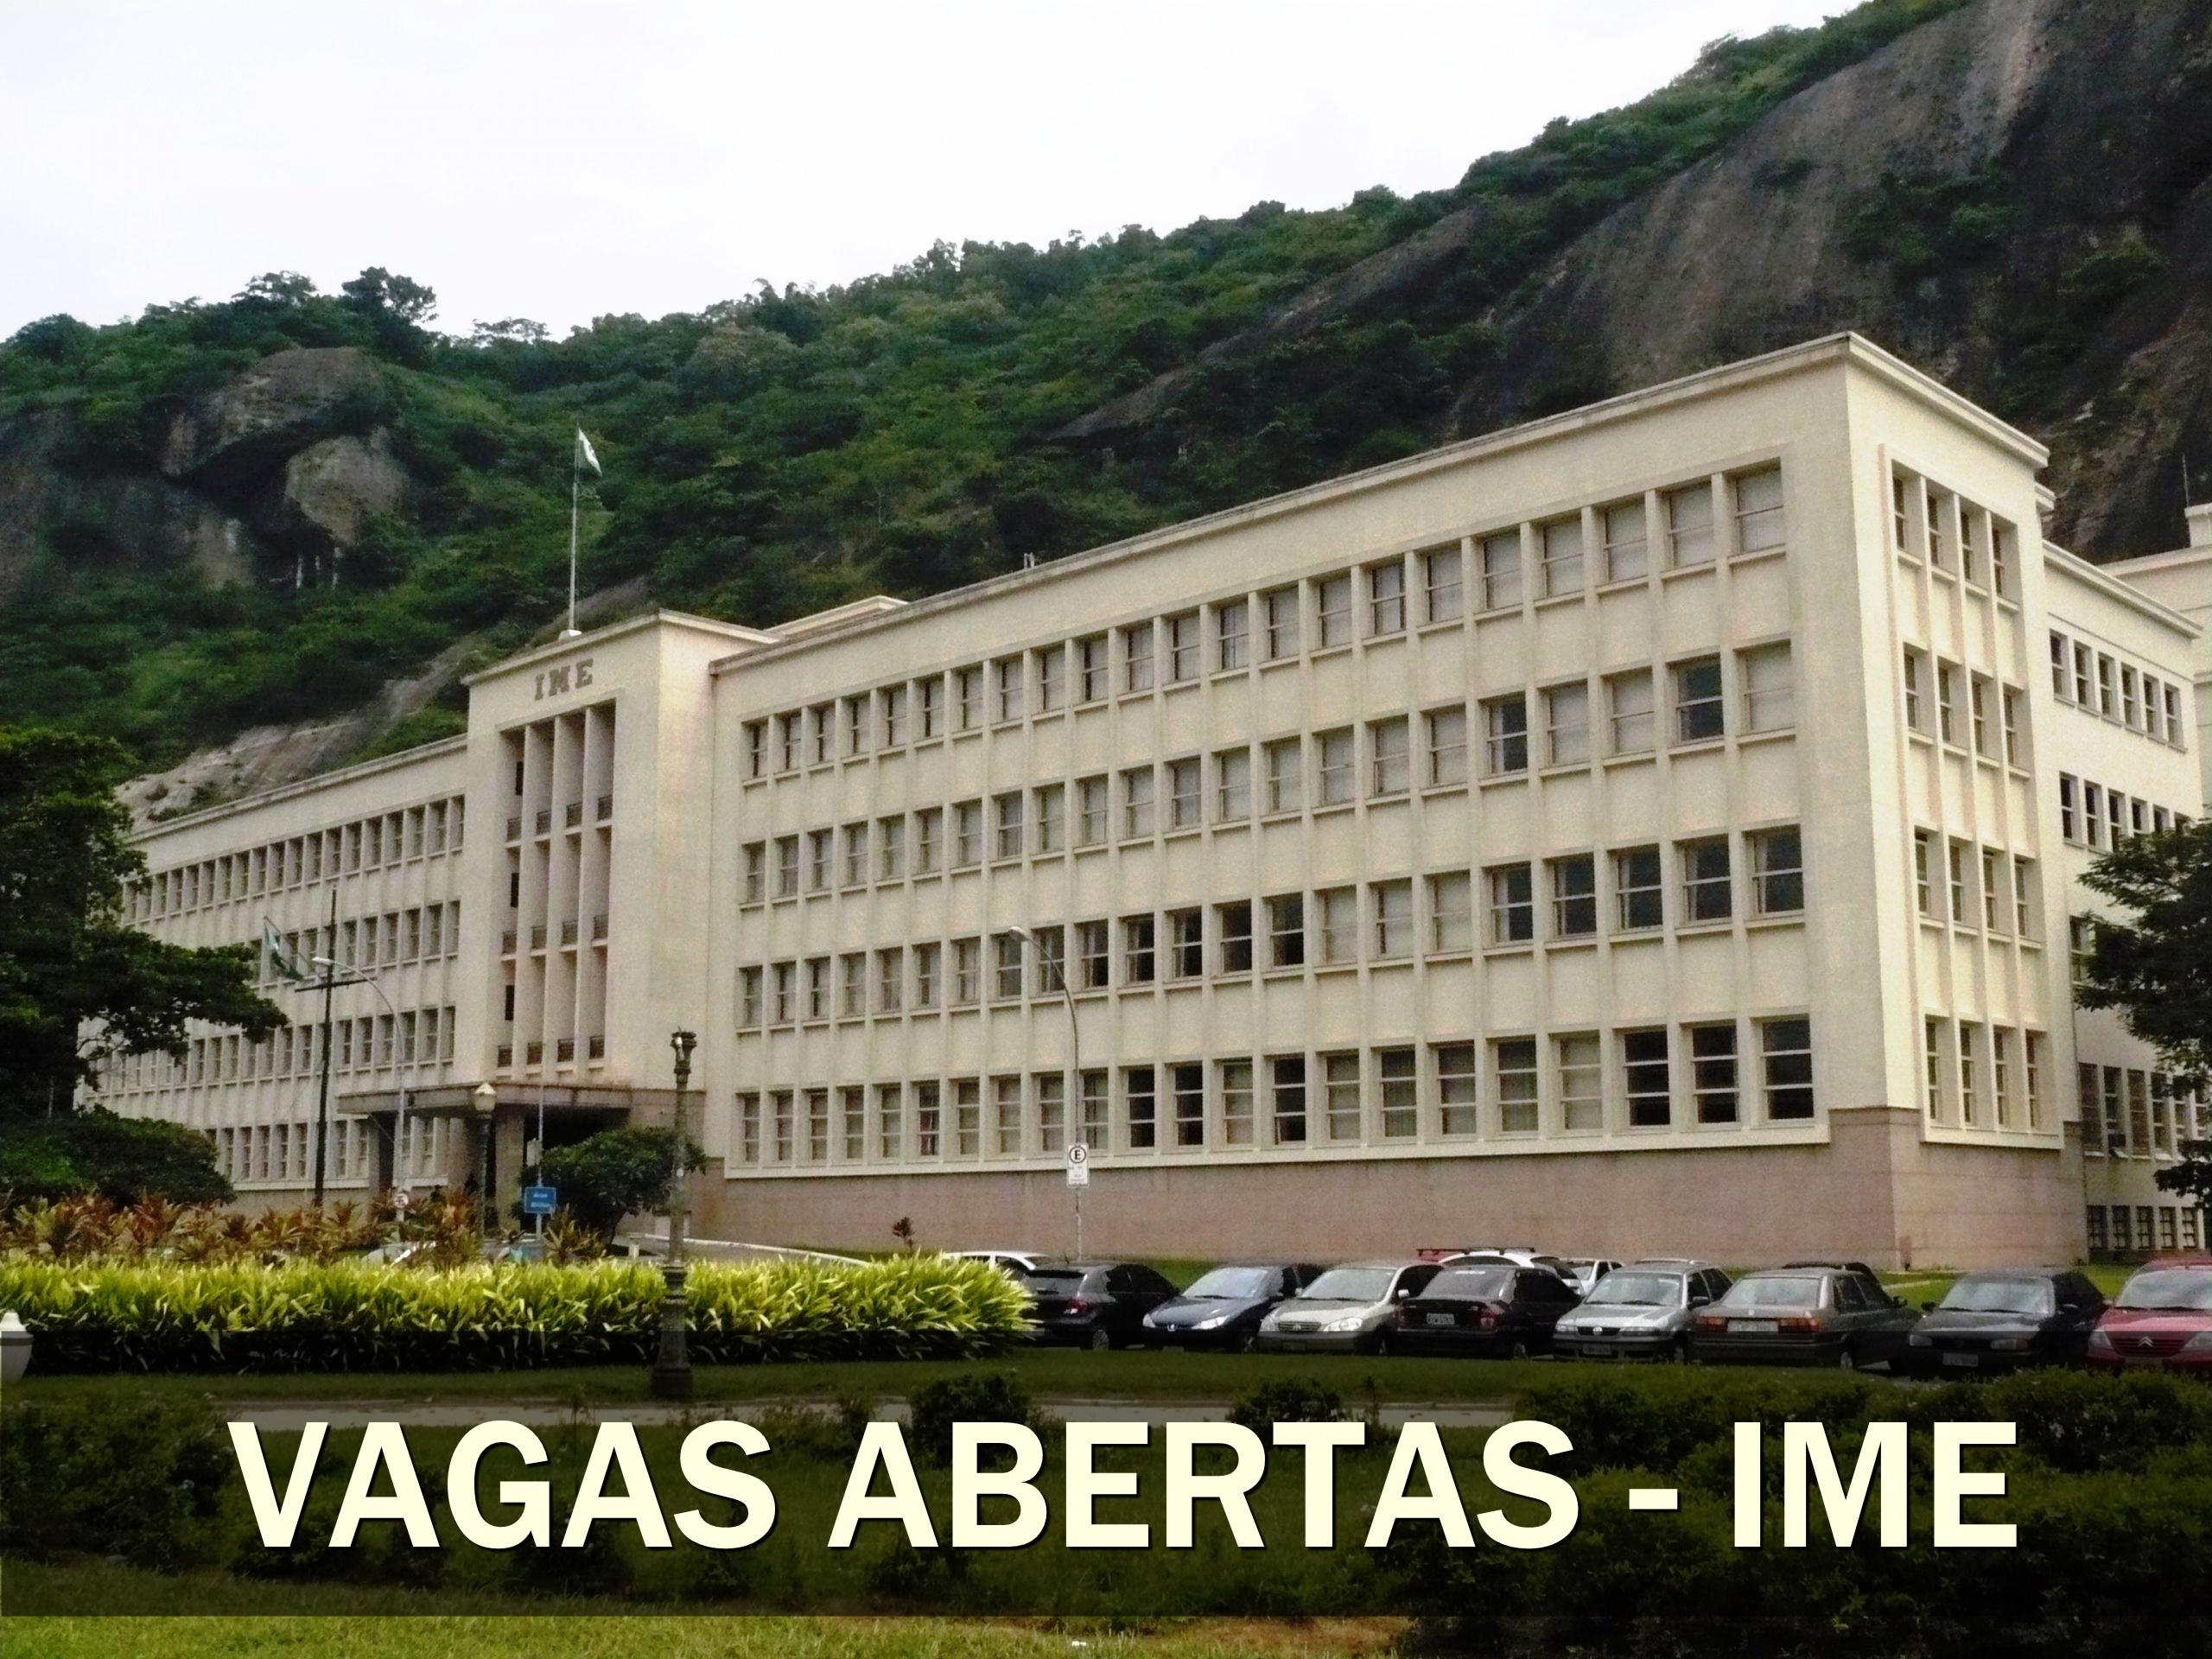 vagas - Instituto Militar de Engenharia - IME - VAGAS concurso - edital - engenharia